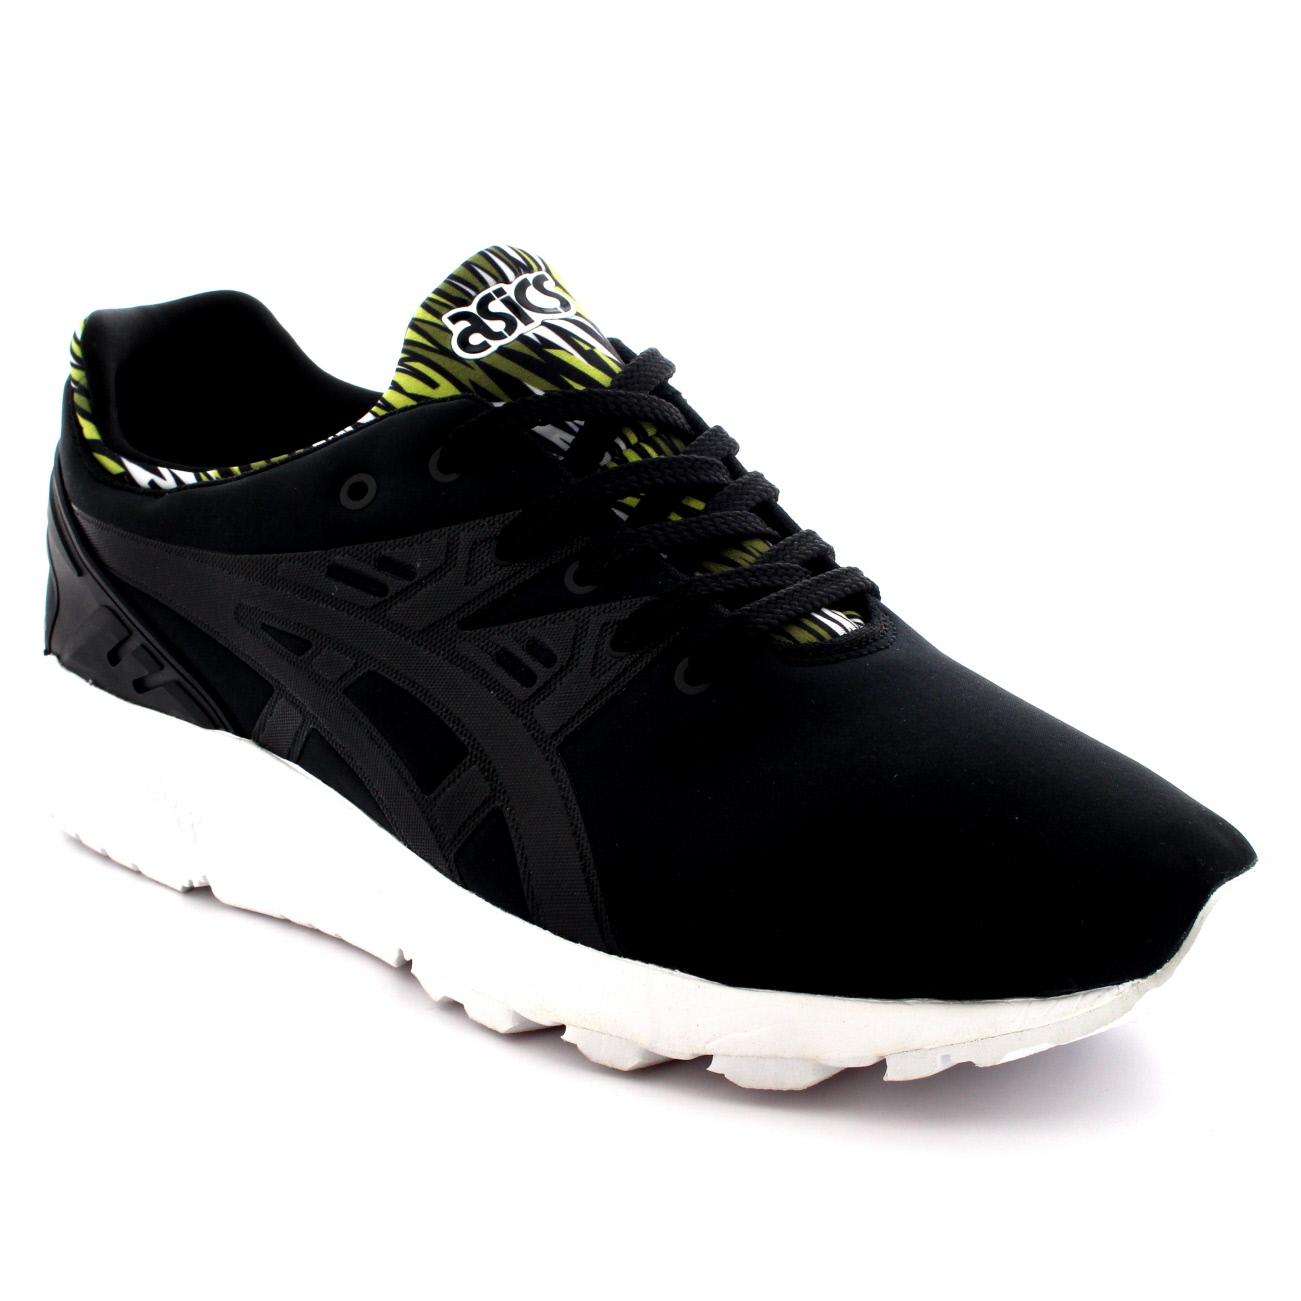 Mens Asics Gel-Kayano Running Sports Slip On Lightweight Sports Trainers UK 7-12